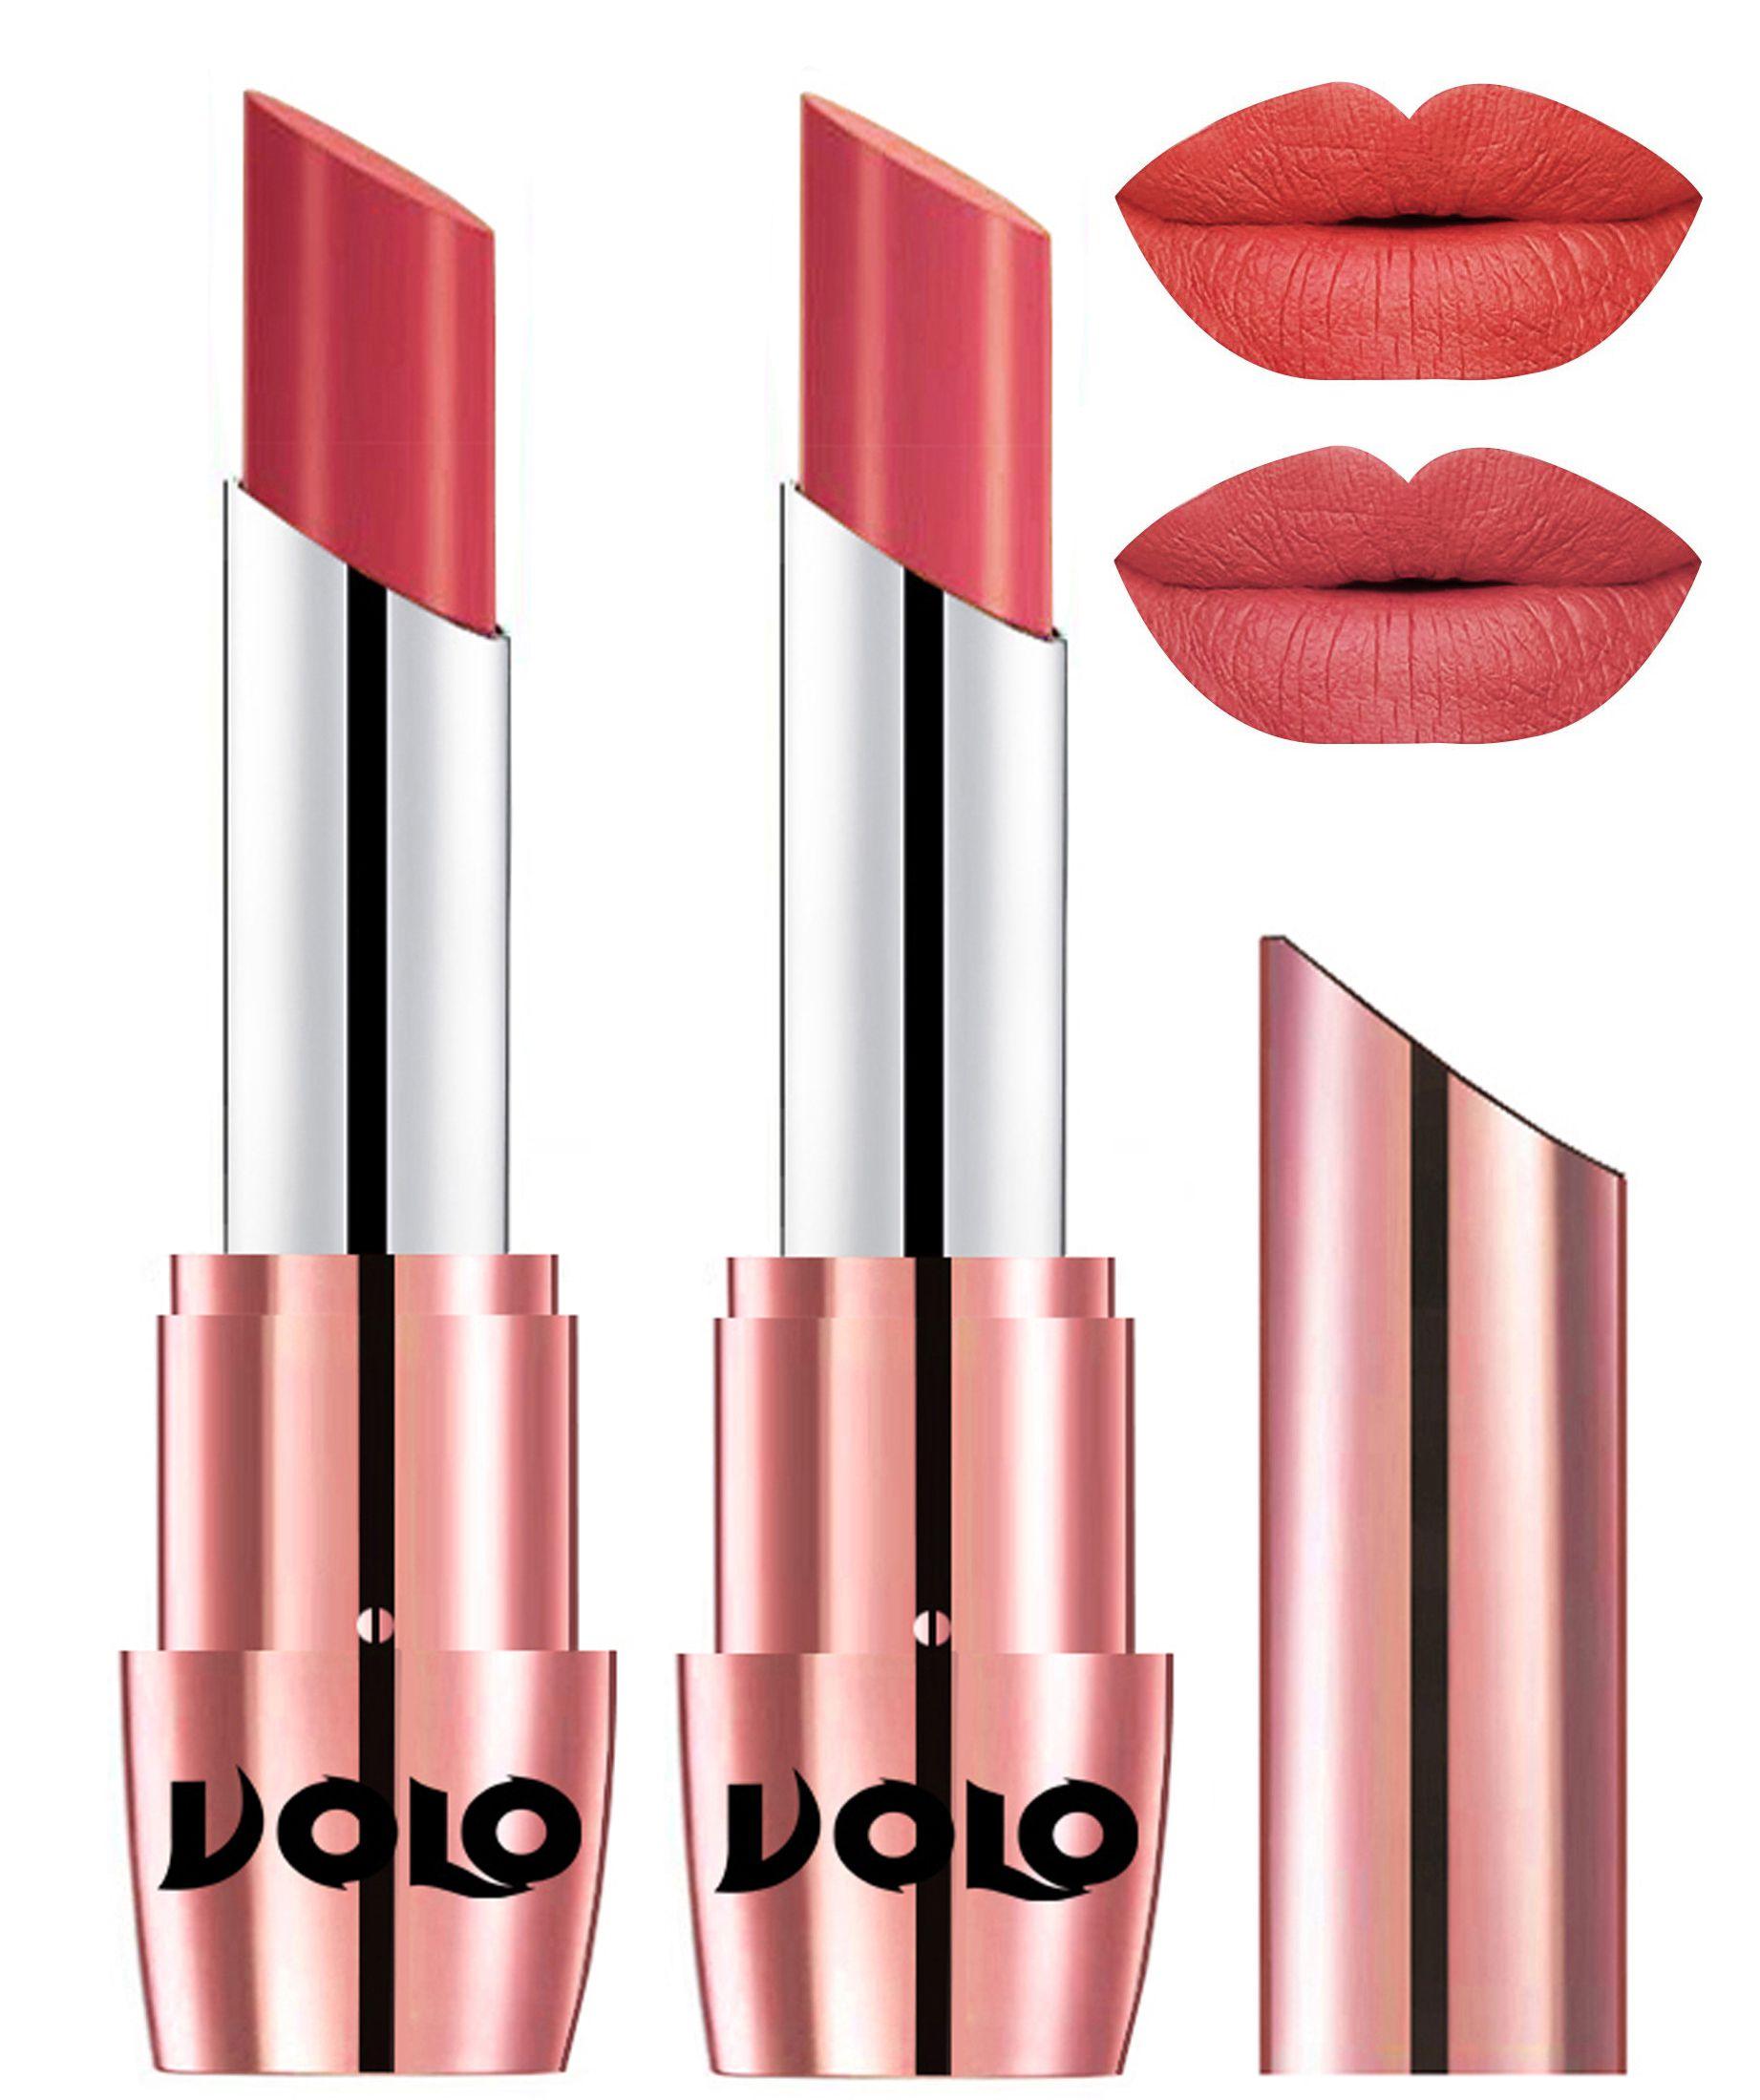 VOLO Perfect Creamy with Matte Lipstick Peach Peach Pack of 2 7 g